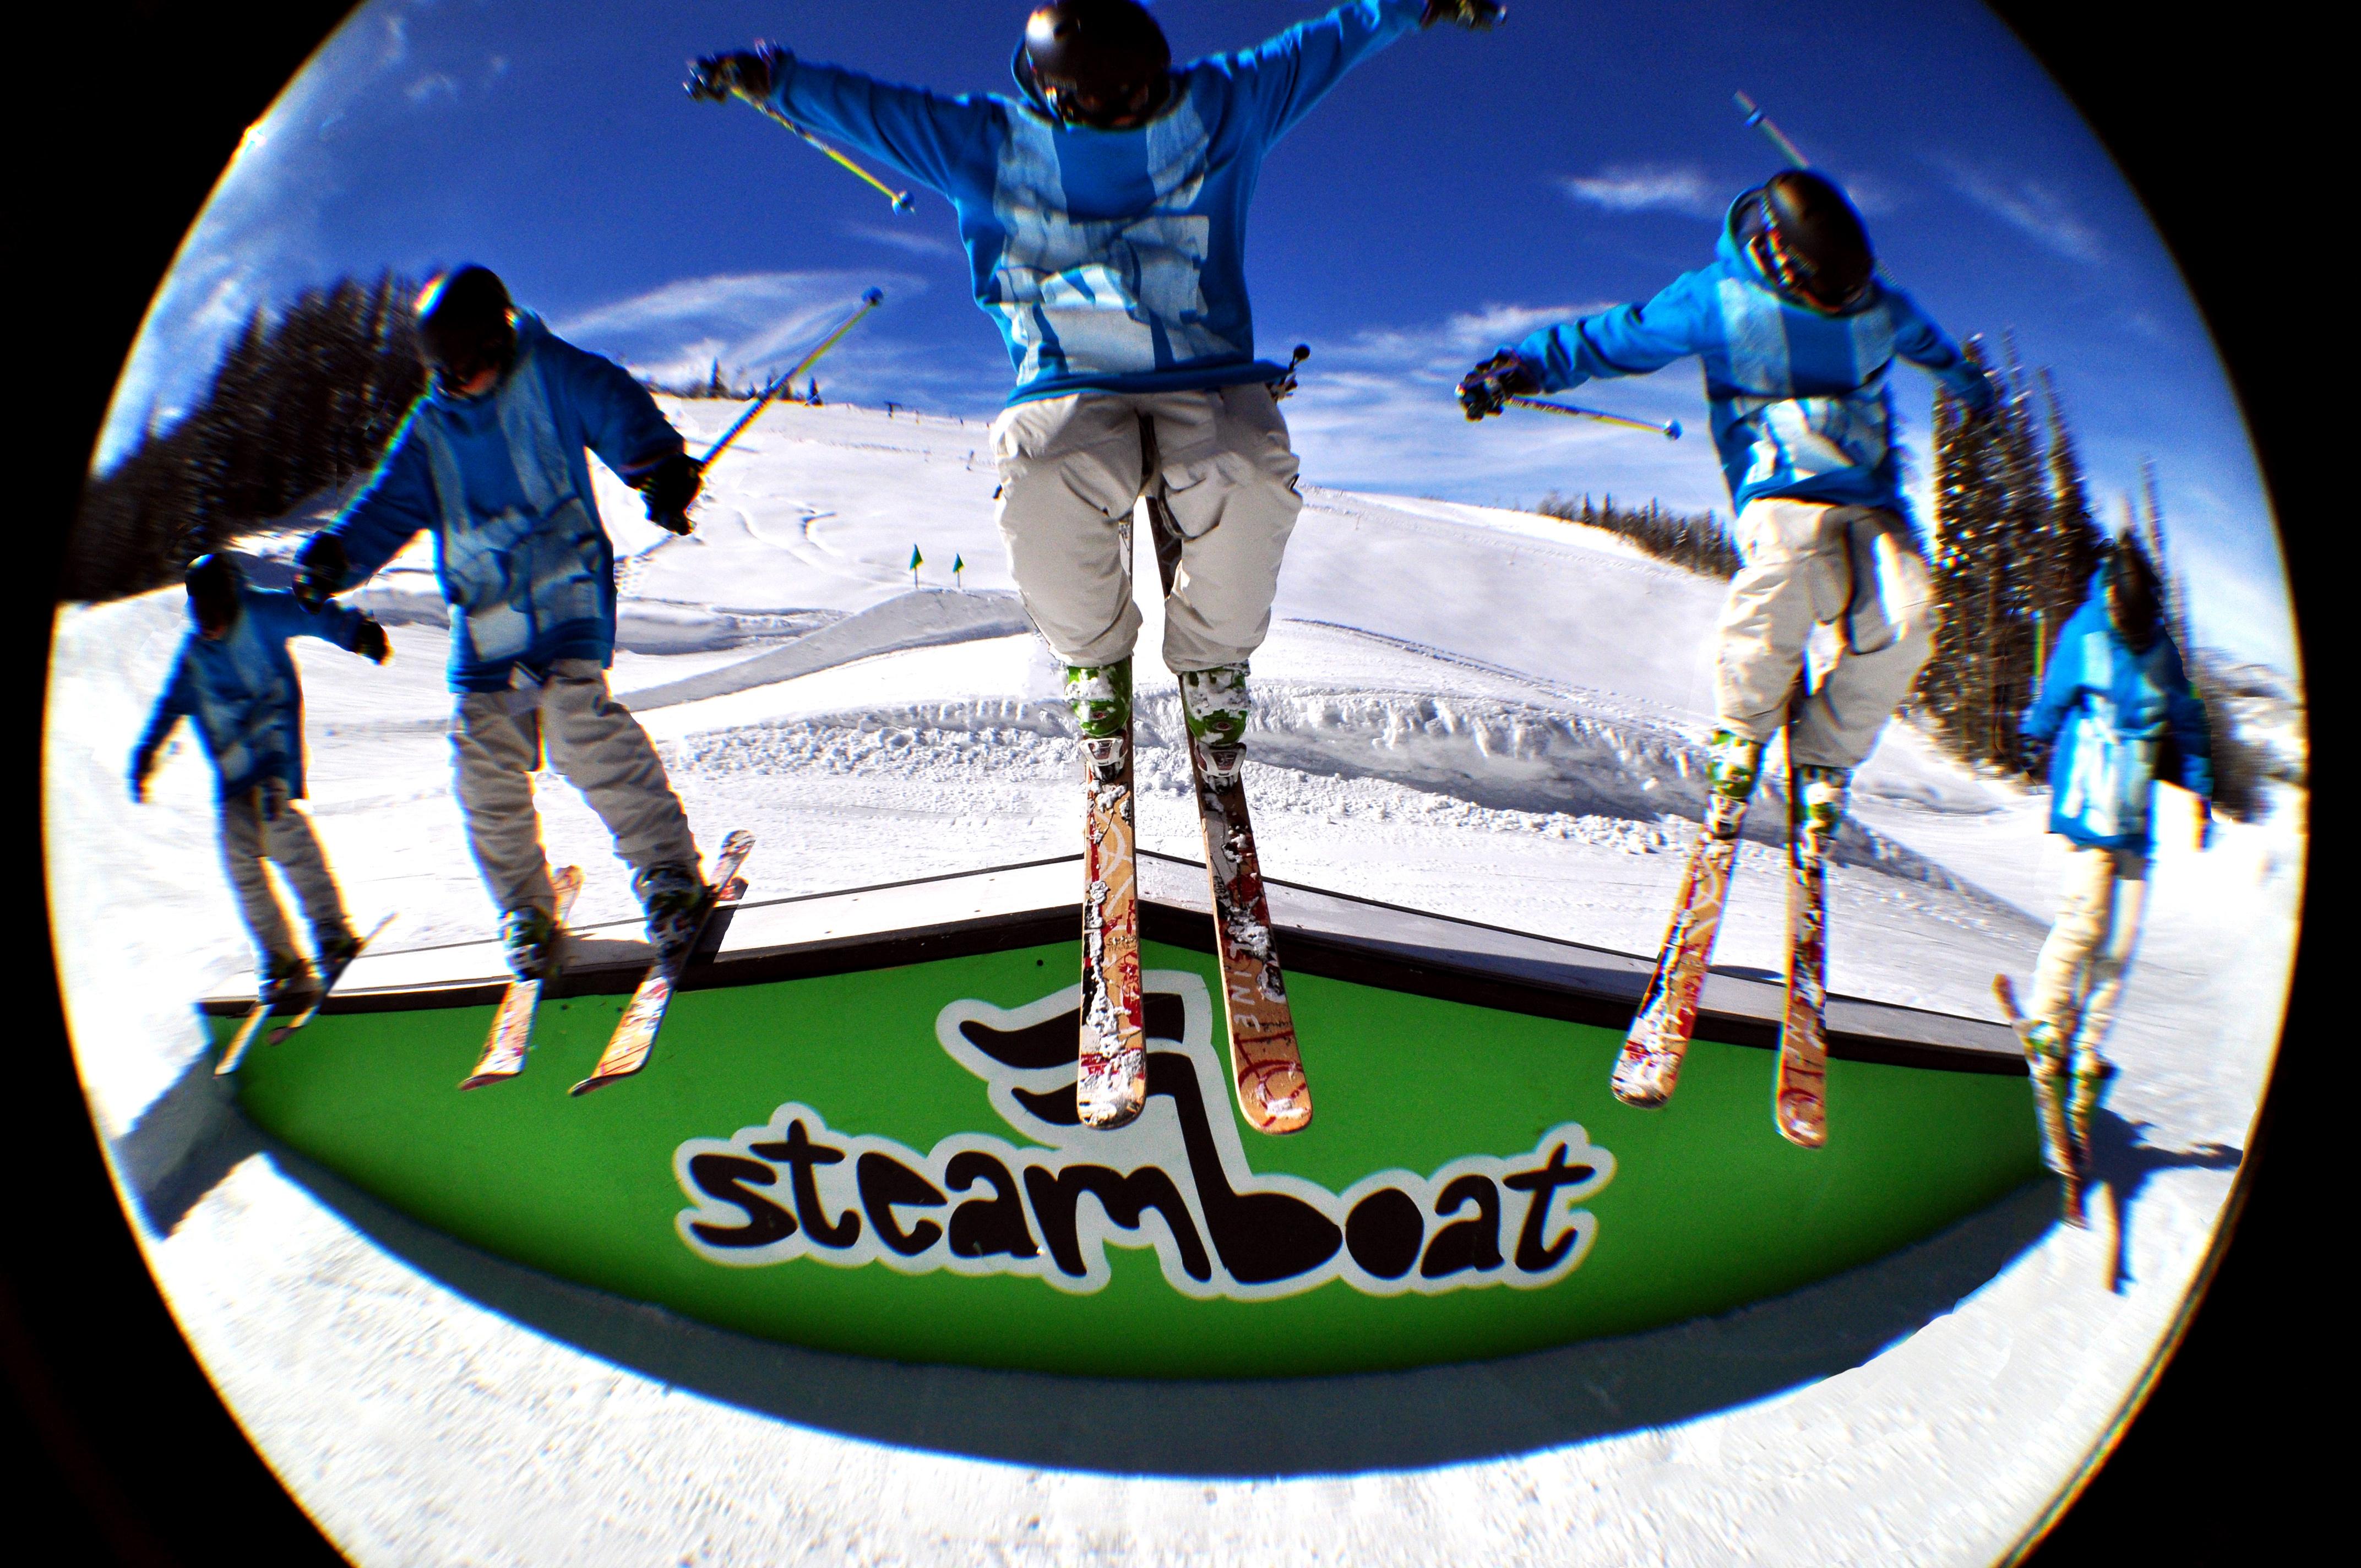 Steamboat Nollie